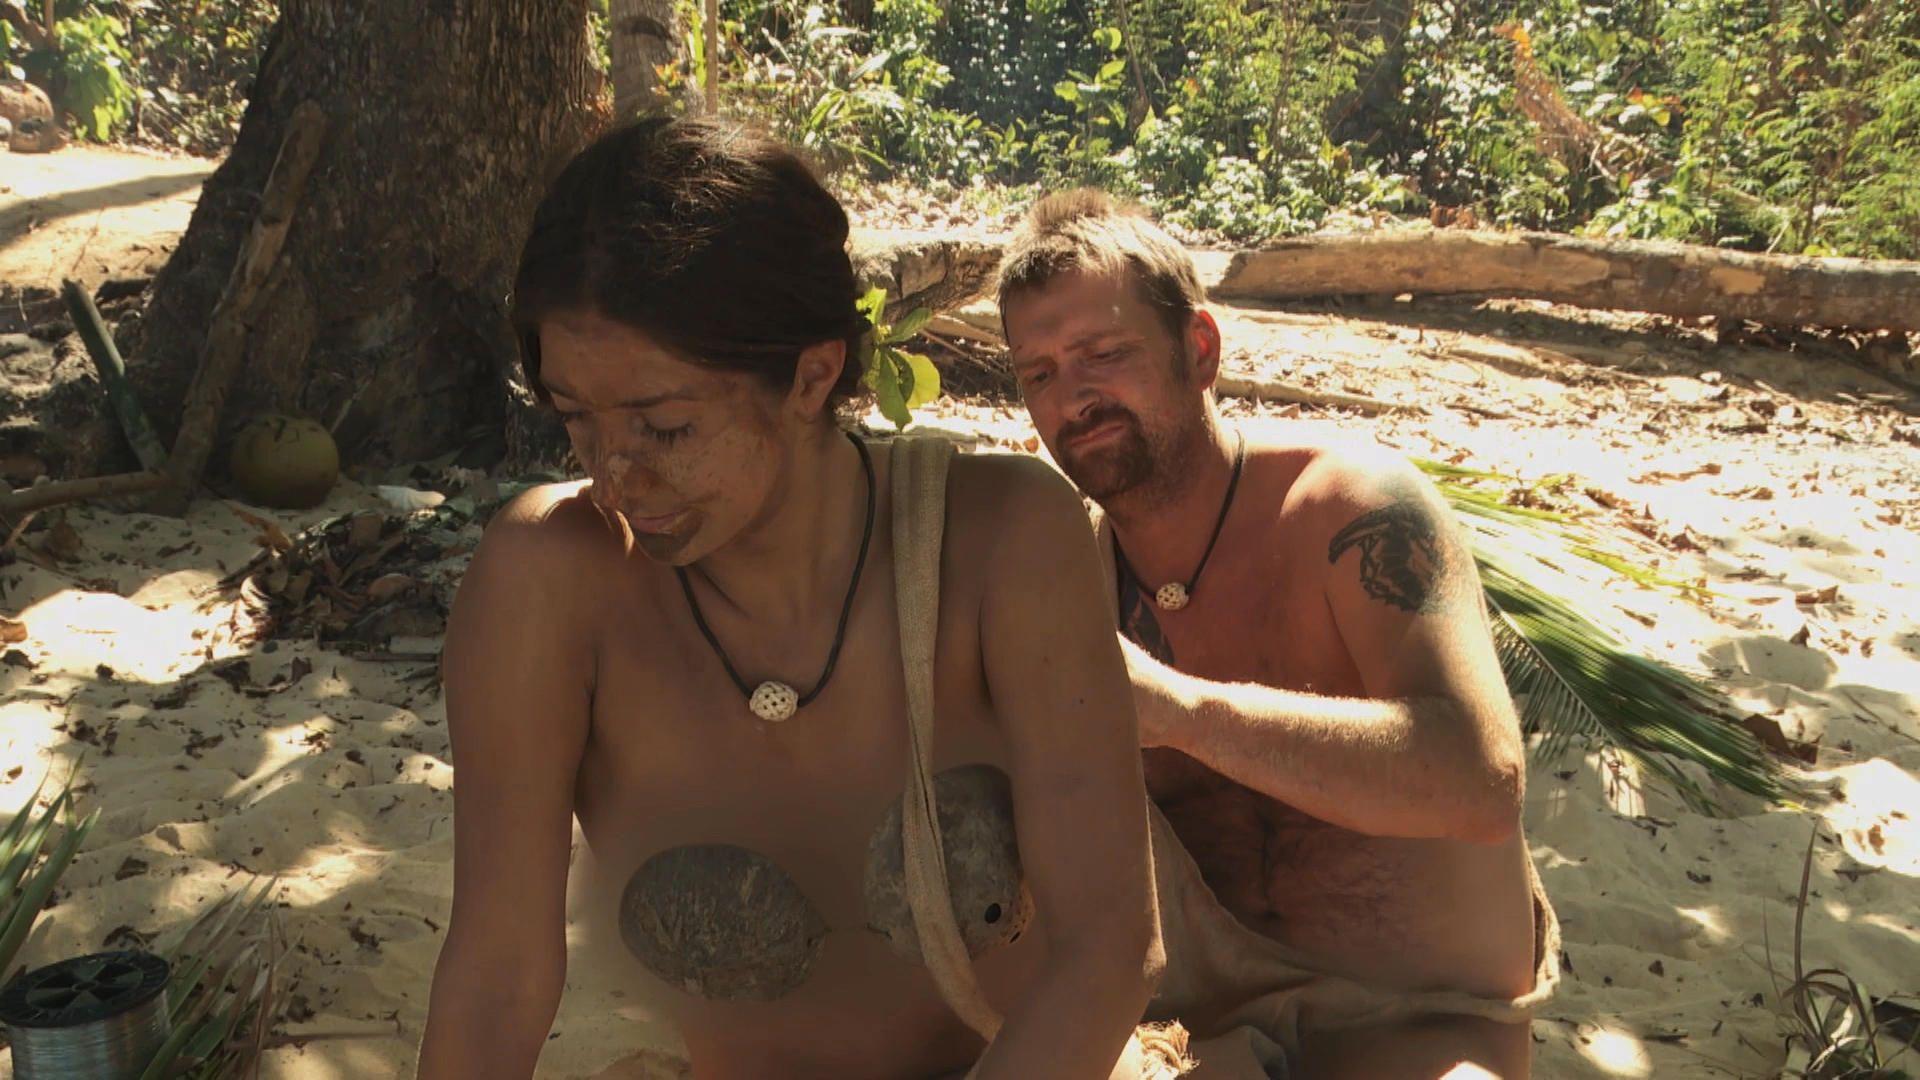 Allison Naked And Afraid survival fashion